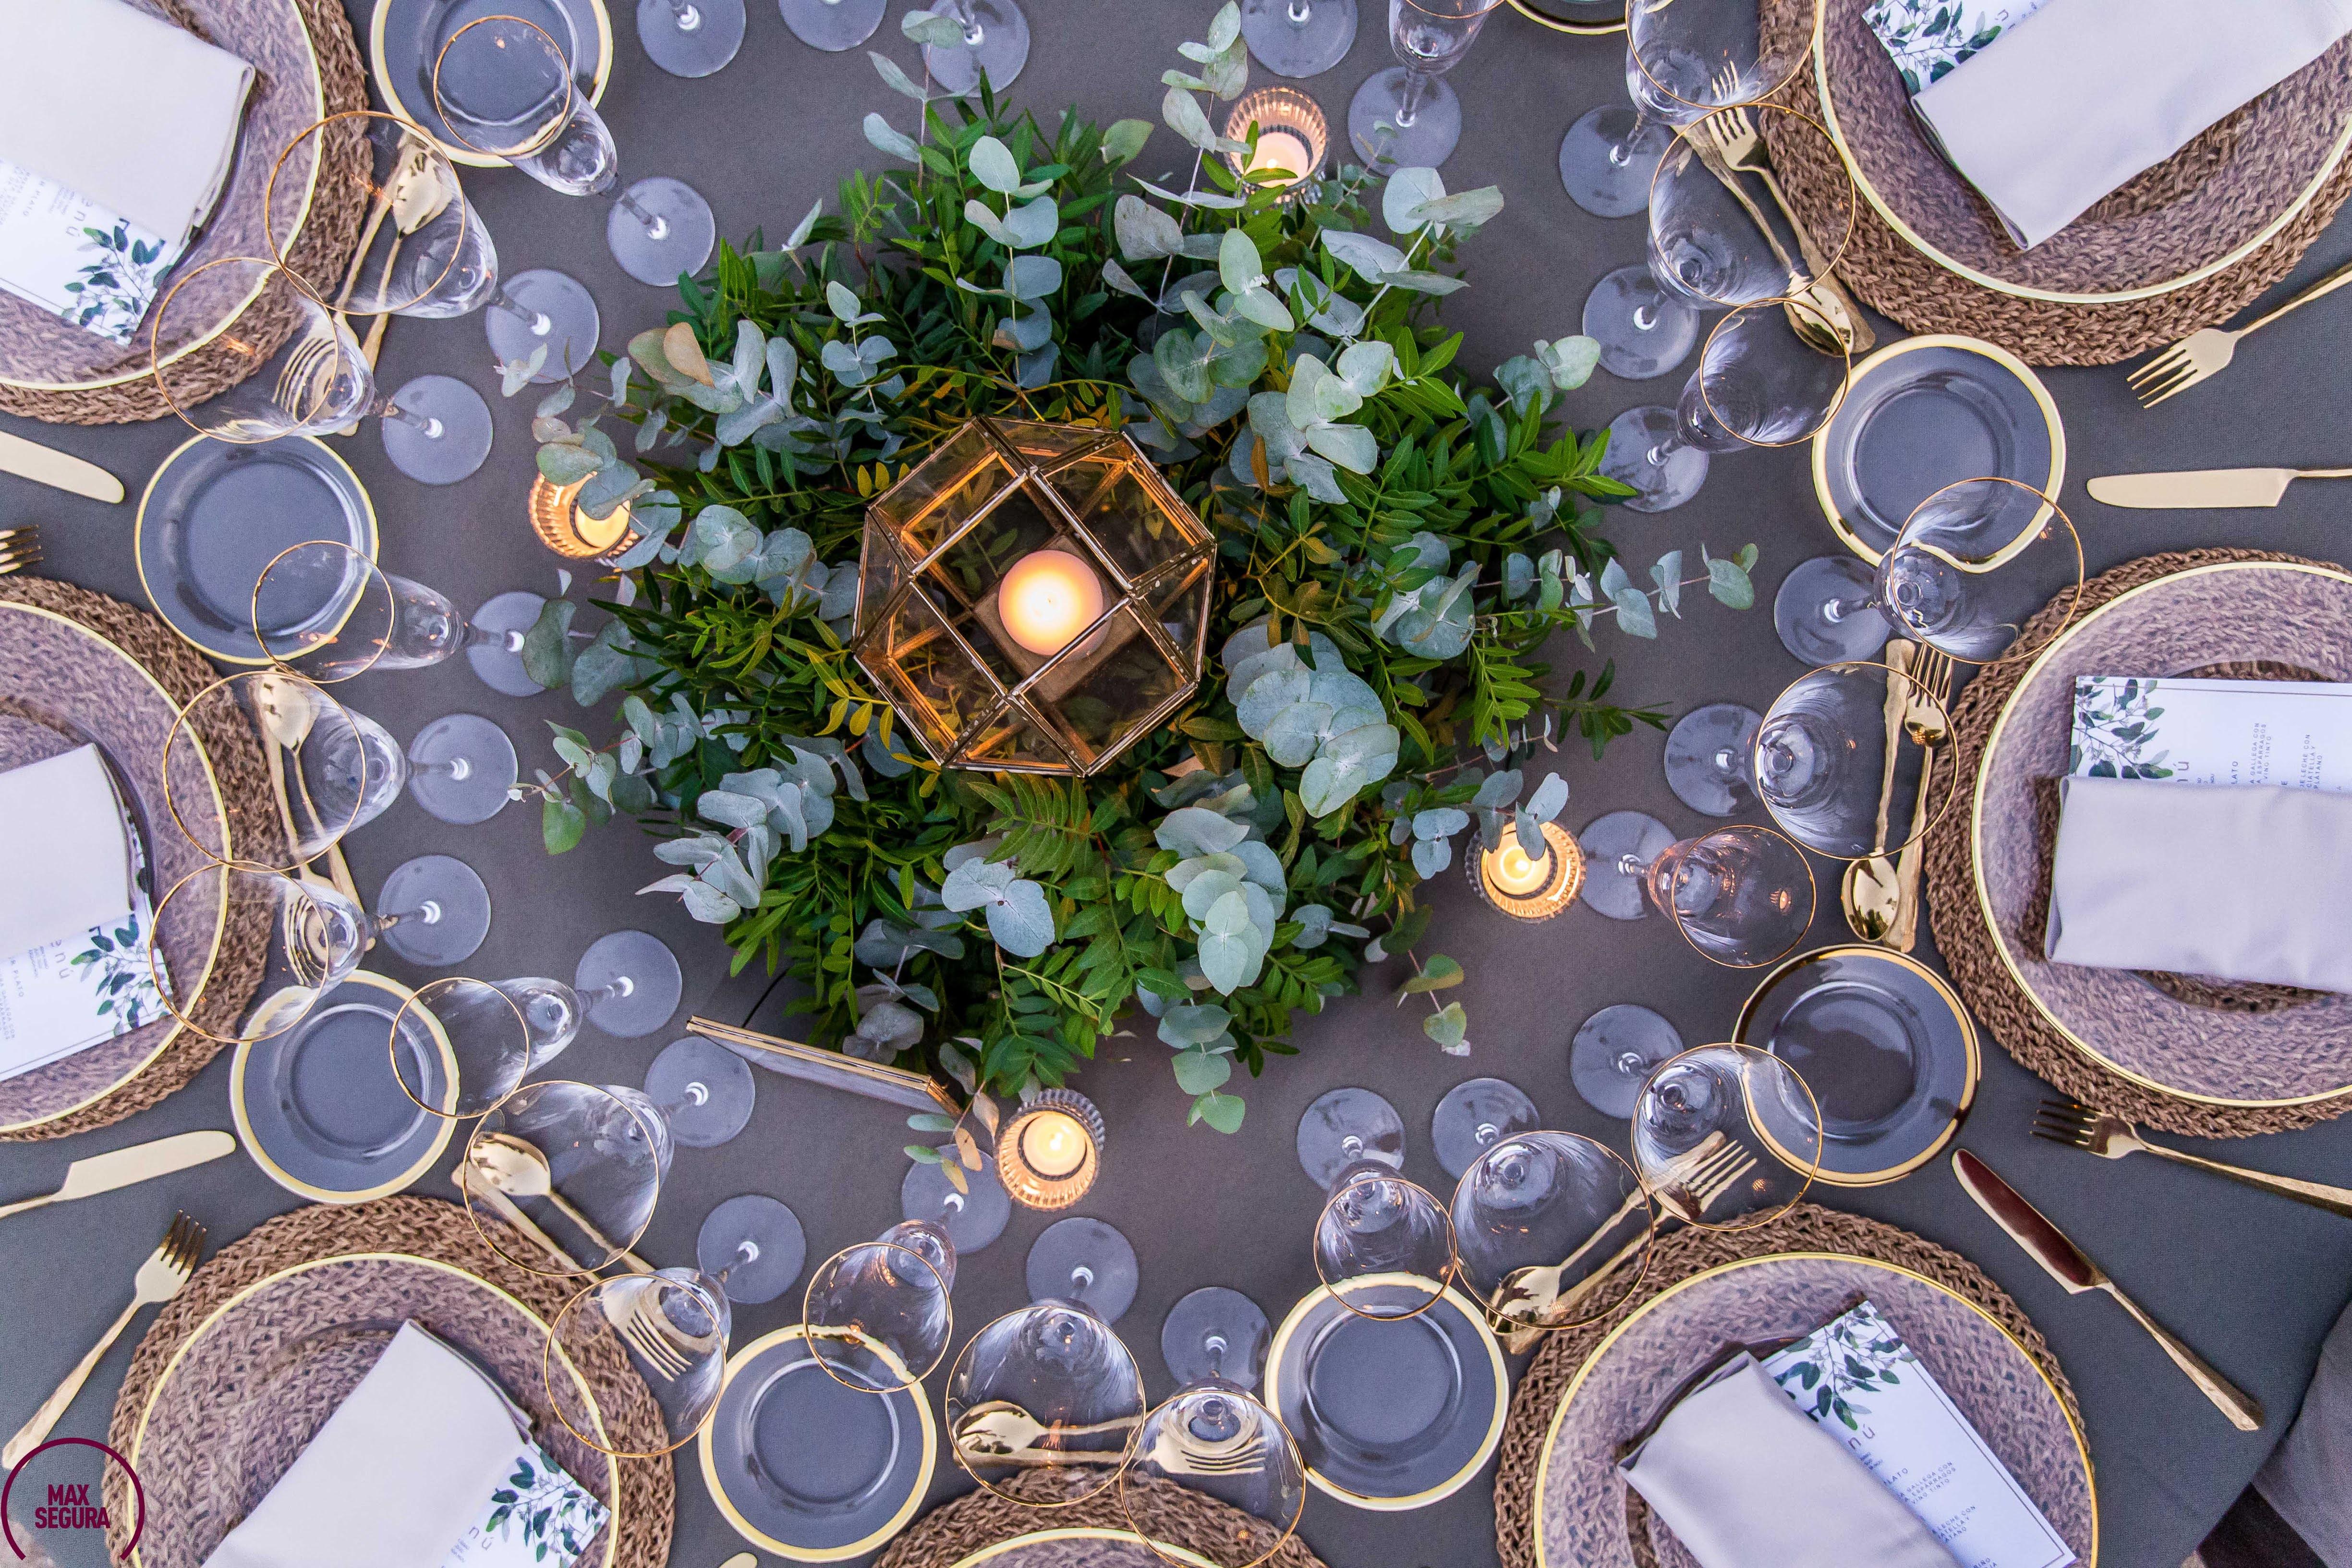 boda-boho-chic-evento-mallorca-grupo-tot-a-punt